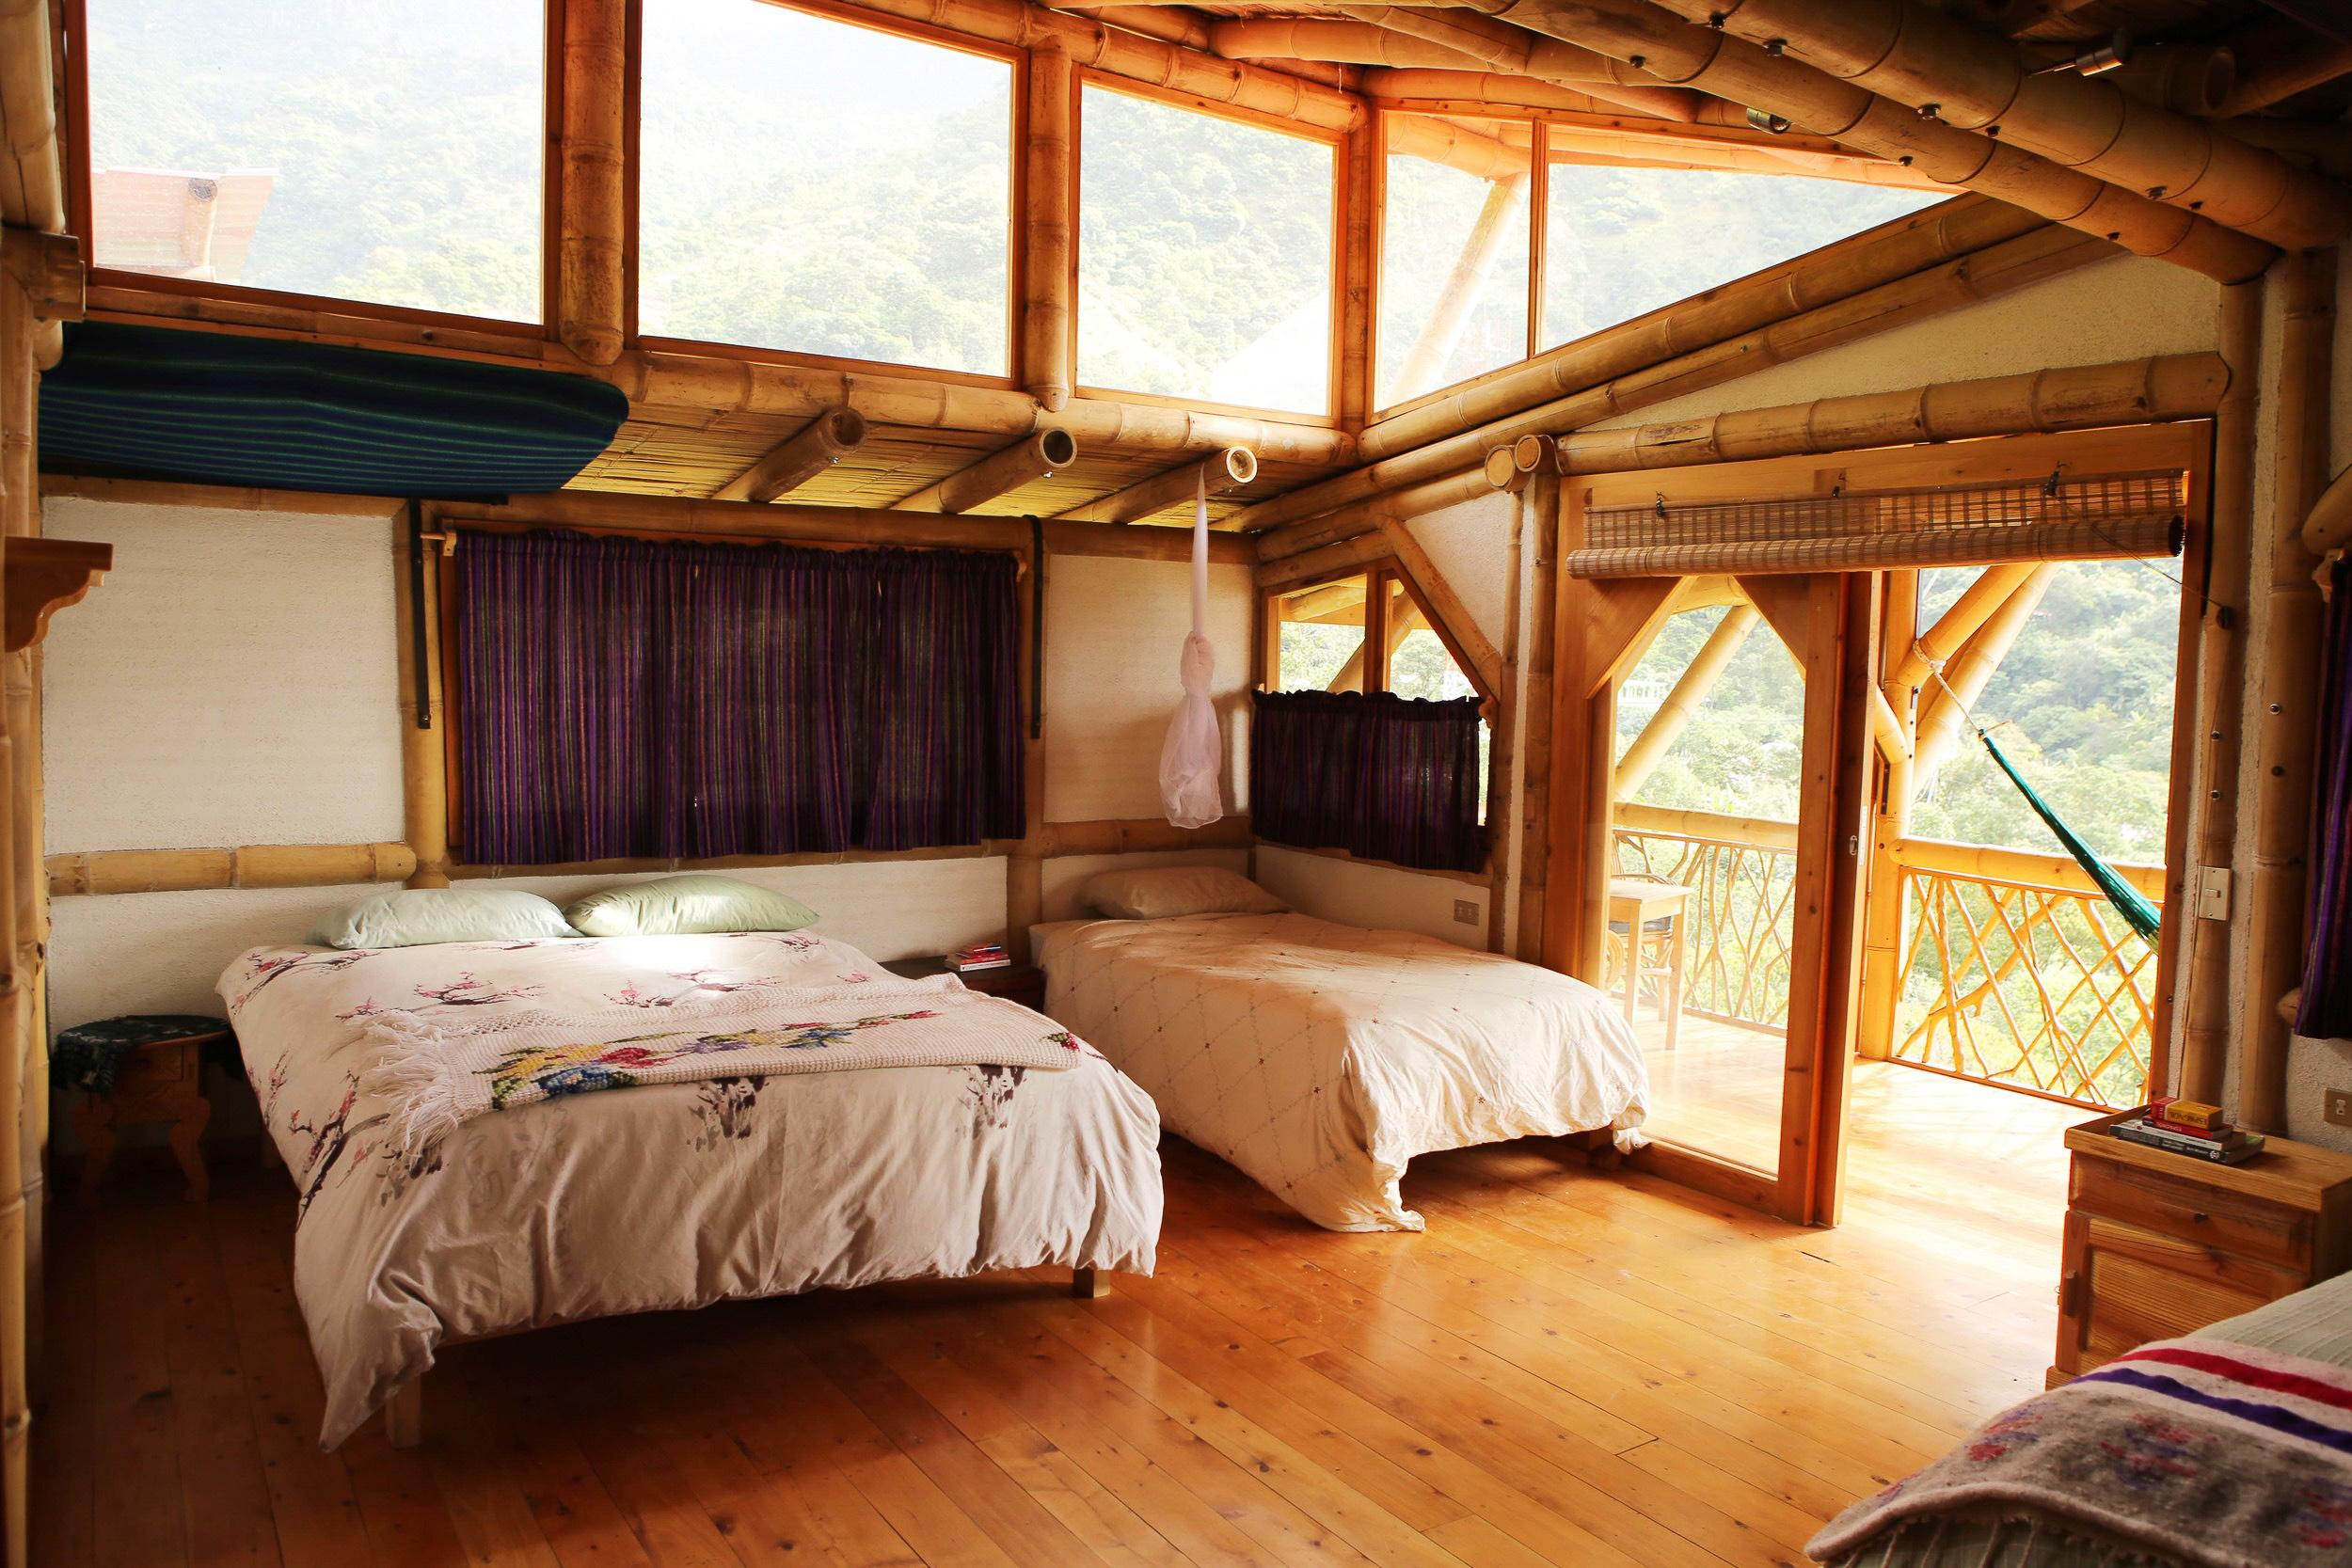 Bambu Guest House, Retreat Center, Natural Building, Atitlan Organics, Lake Atitlan, Guatemala, Central America, Regenerative Design, Permaculture